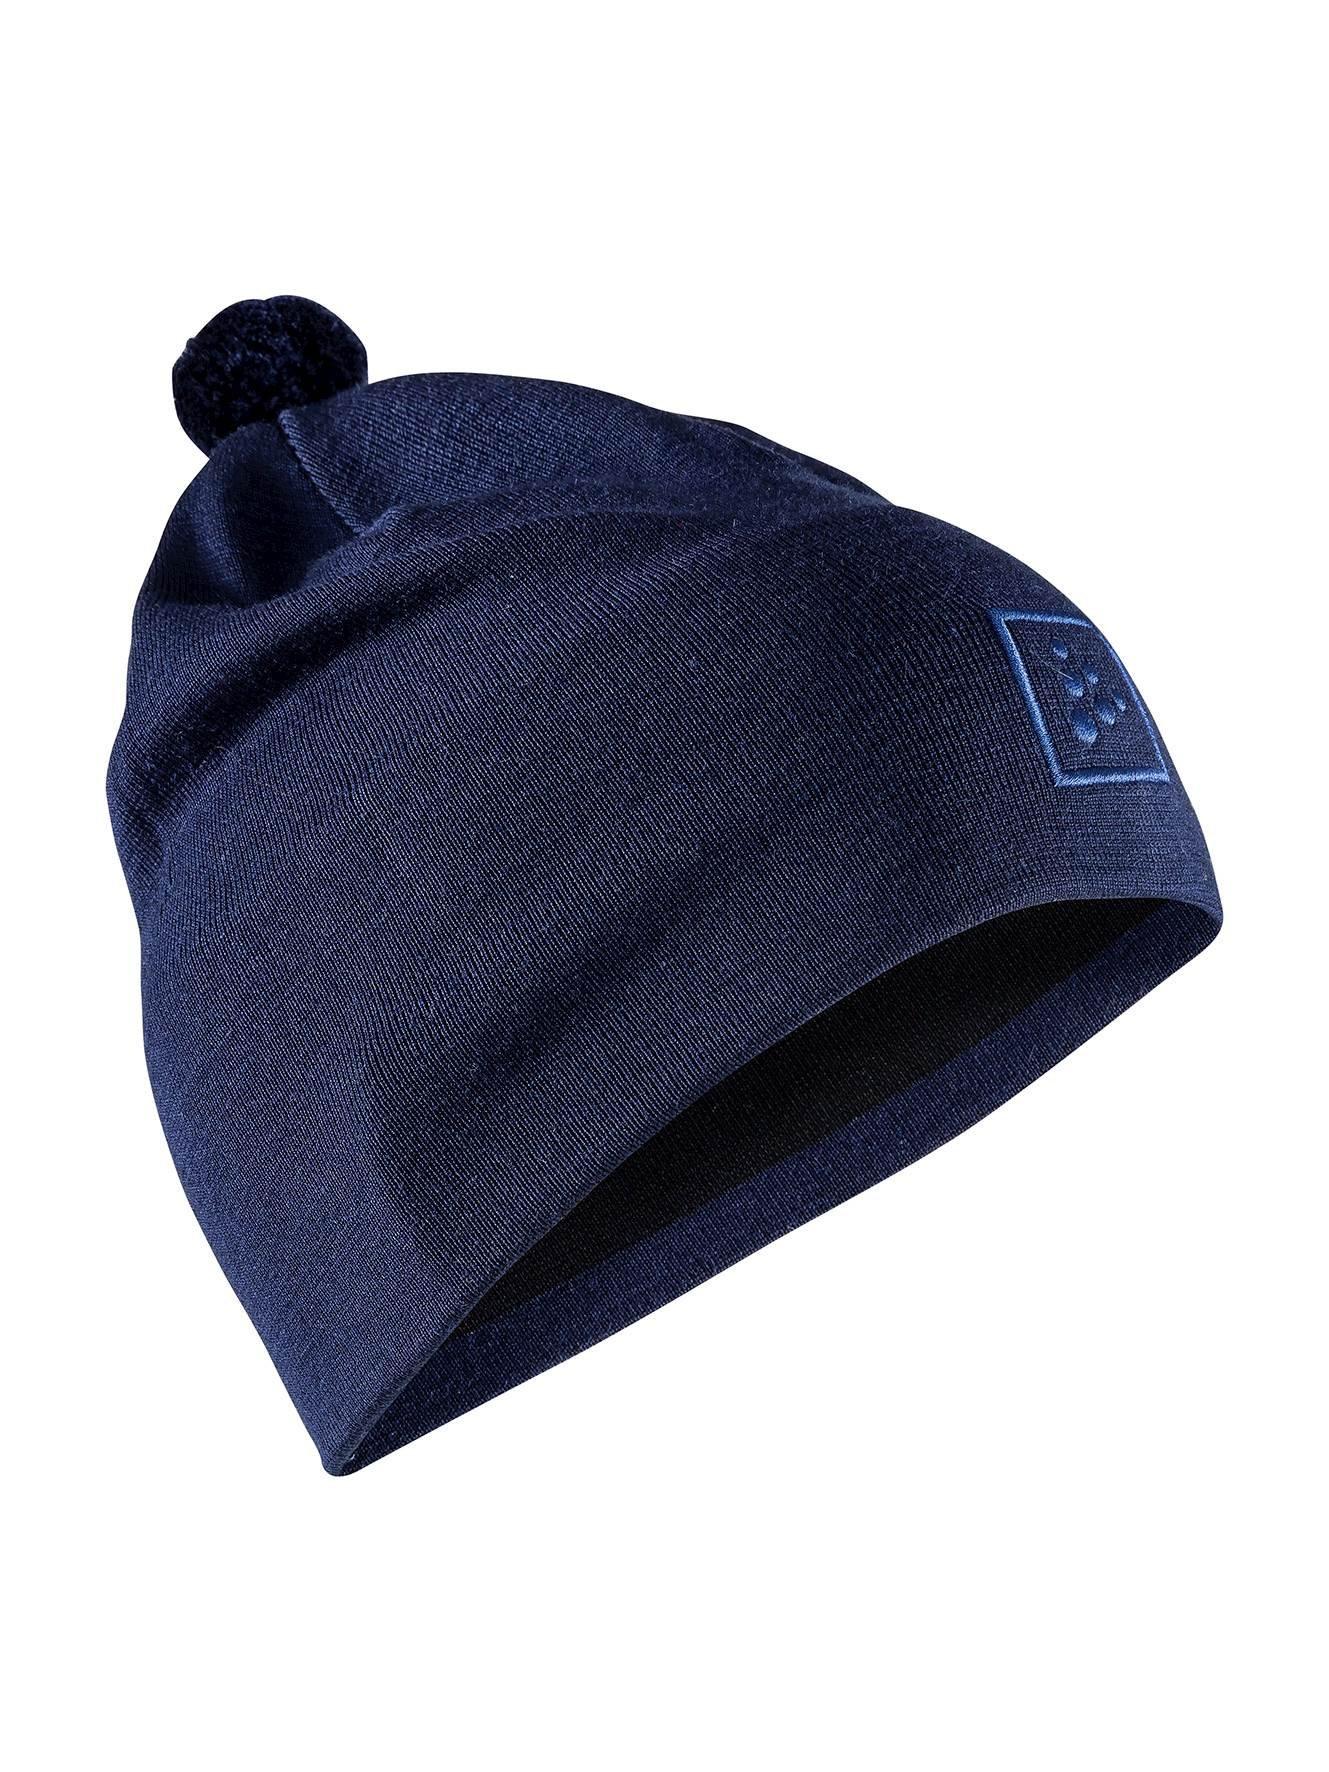 Craft Čiapky Practice Knit tmavo modrá